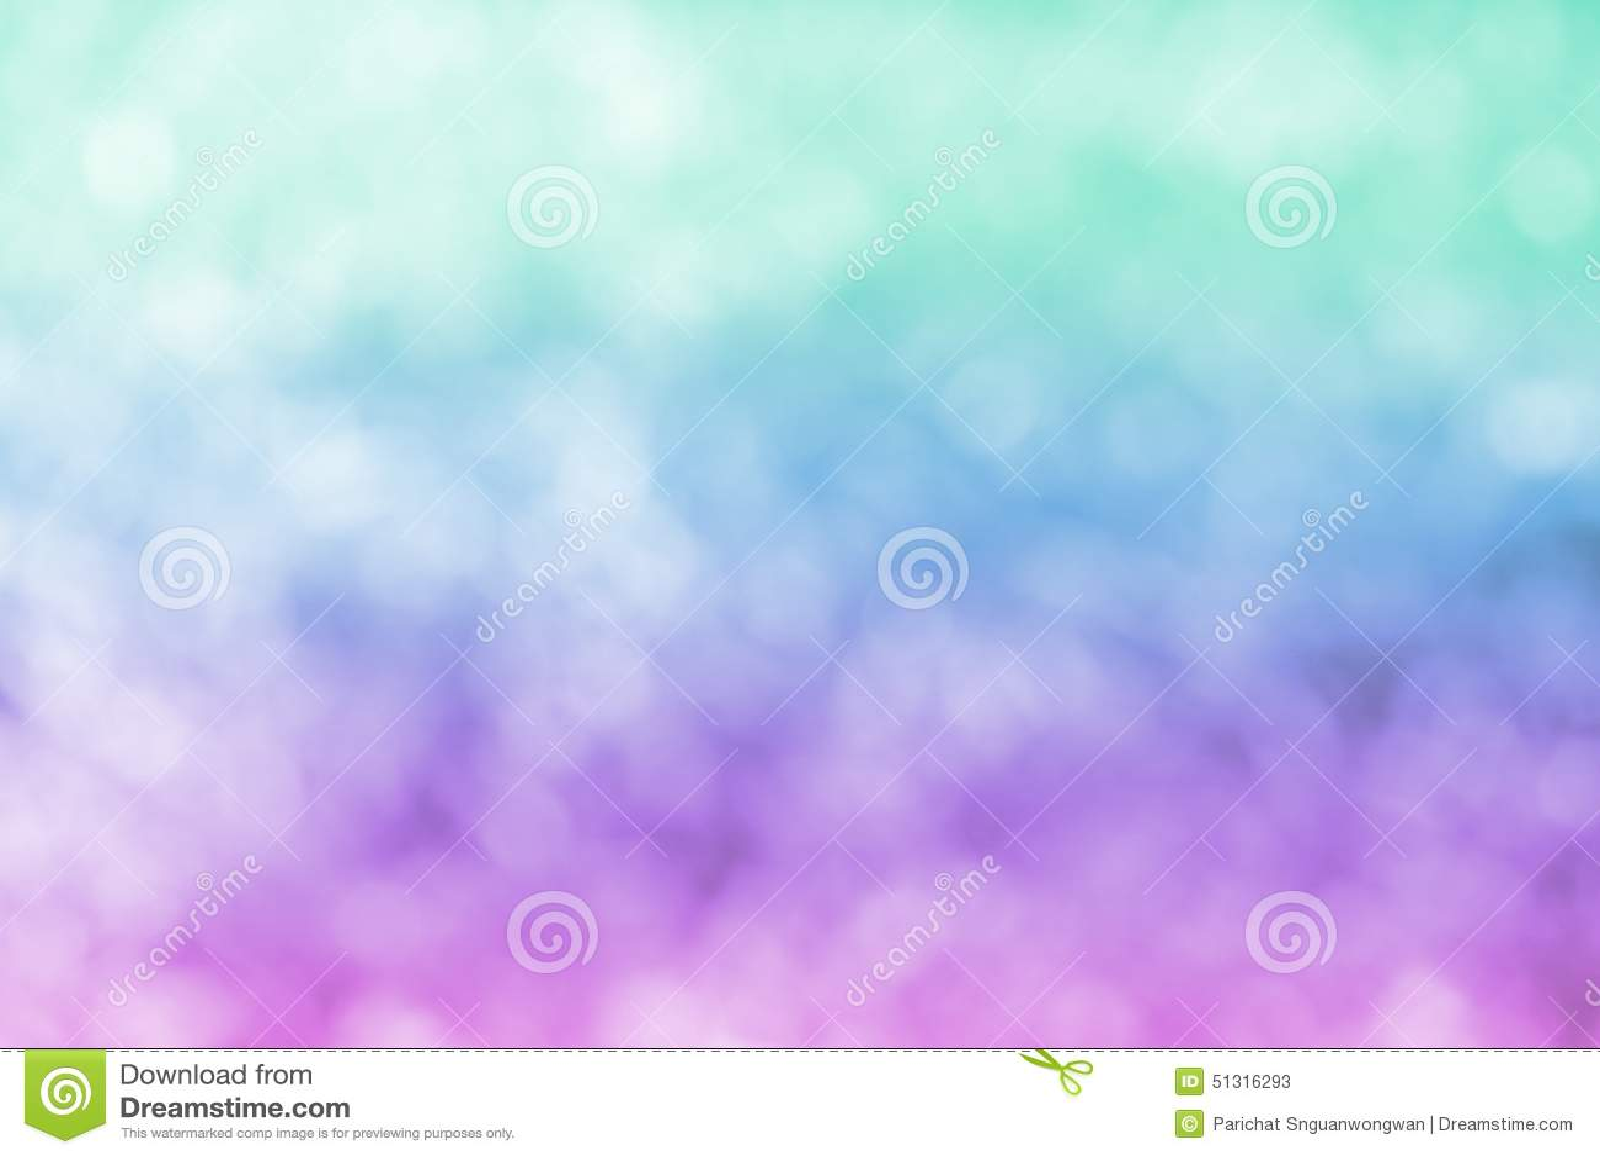 pastel purple blue green bokeh background stock photo image 51316293. Black Bedroom Furniture Sets. Home Design Ideas